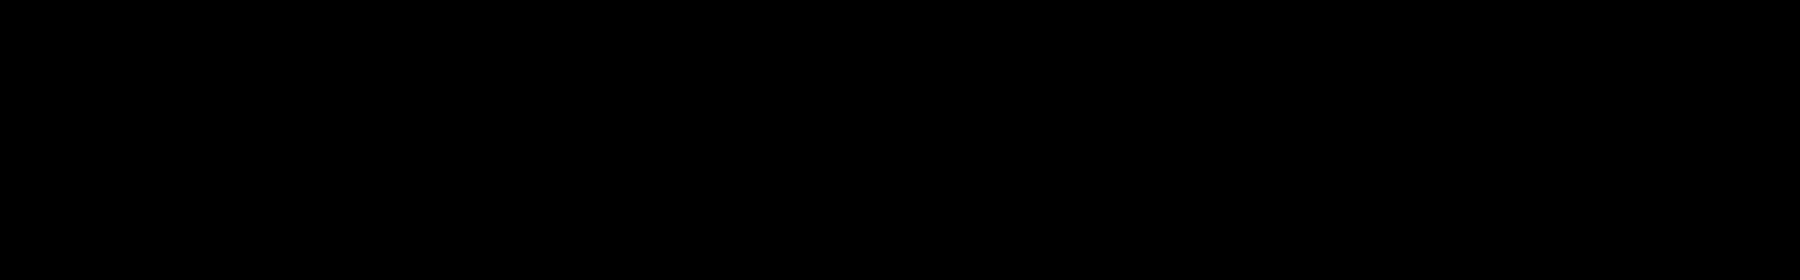 Psynation audio waveform